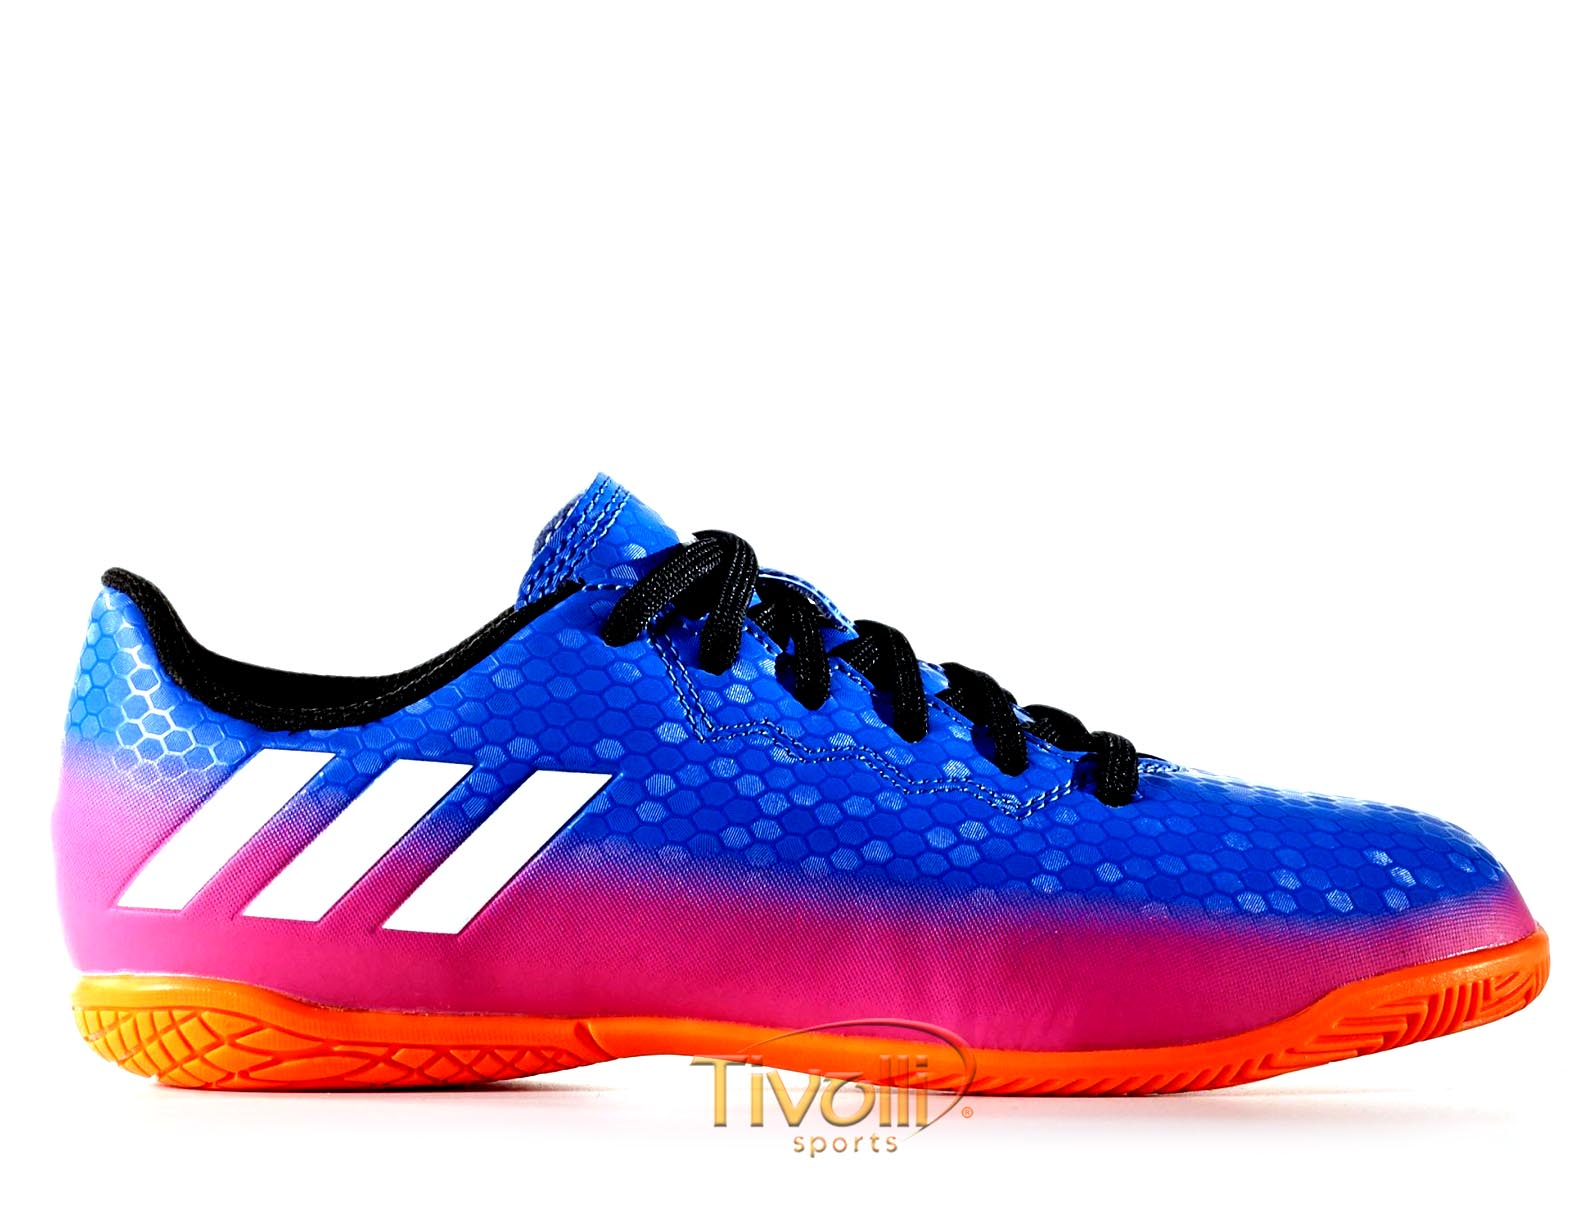 b4cb58e4d0 Chuteira Adidas Messi 16.4 IC Futsal Infantil